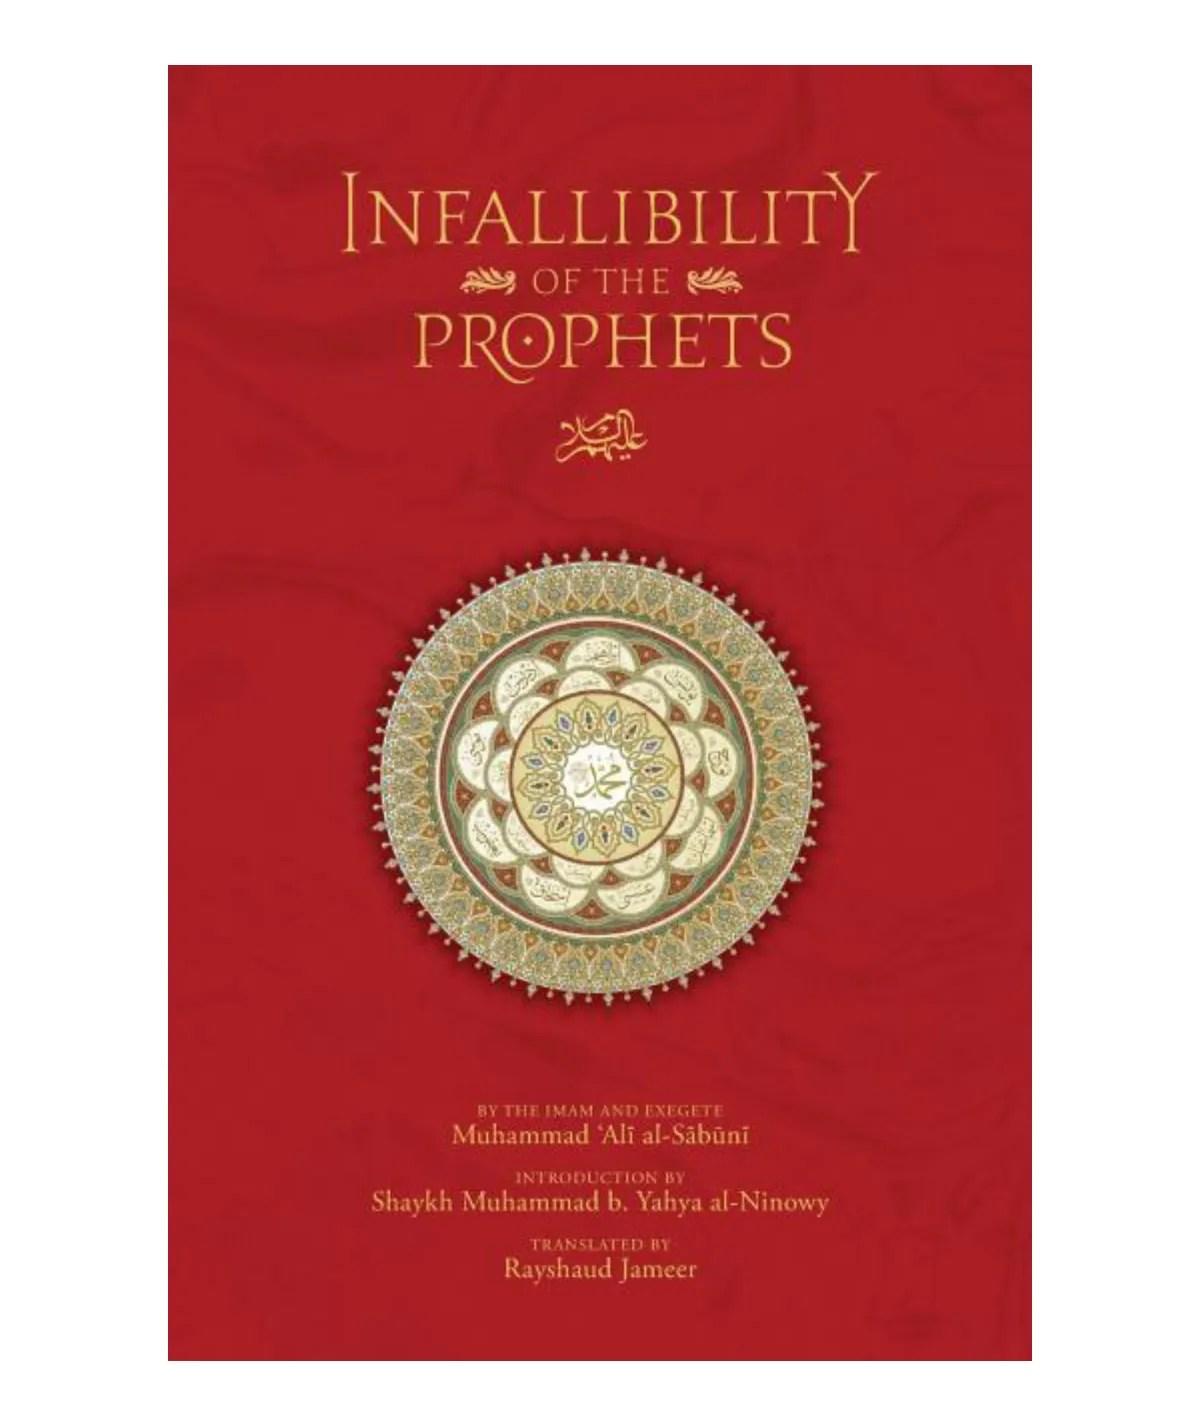 The Infallibility of the Prophets: Al-Sabuni, Muhammad Ali | Jameer, Rayshaud | Al-Ninowy, Muhammad B Yahya